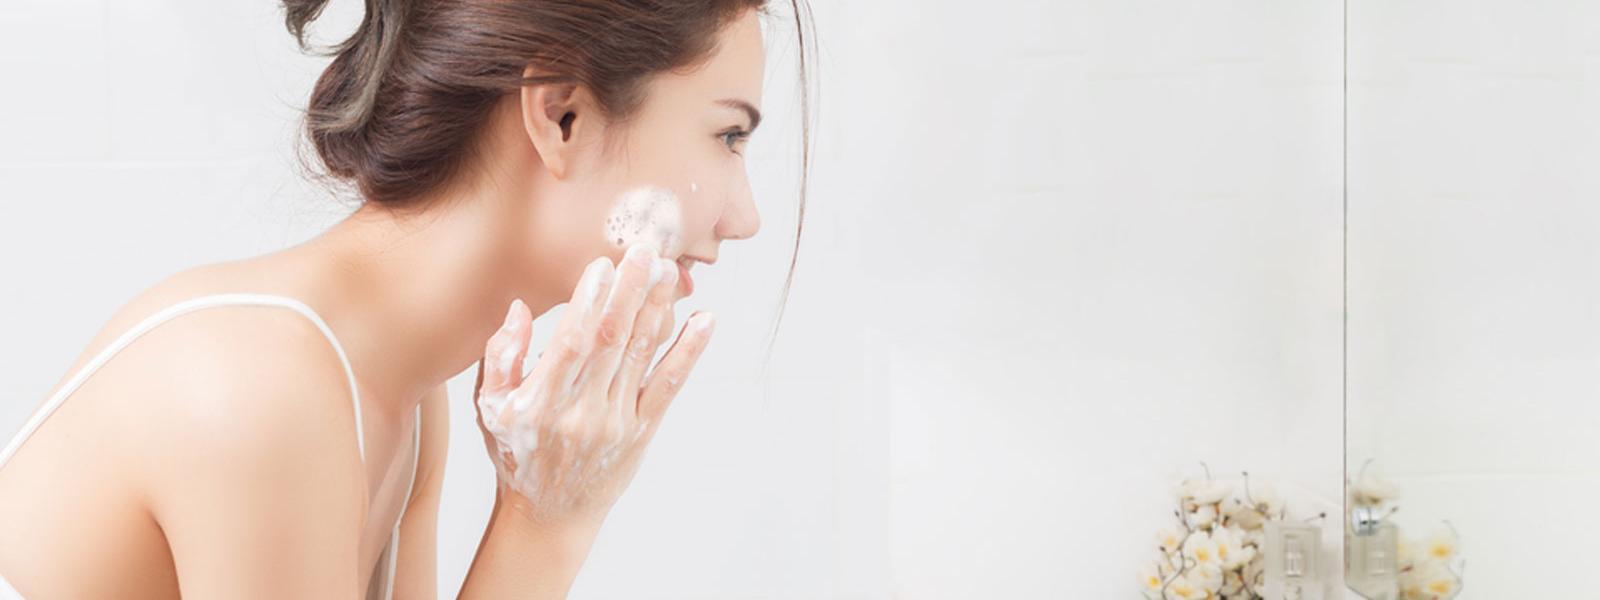 10 Benefits Of Exfoliation